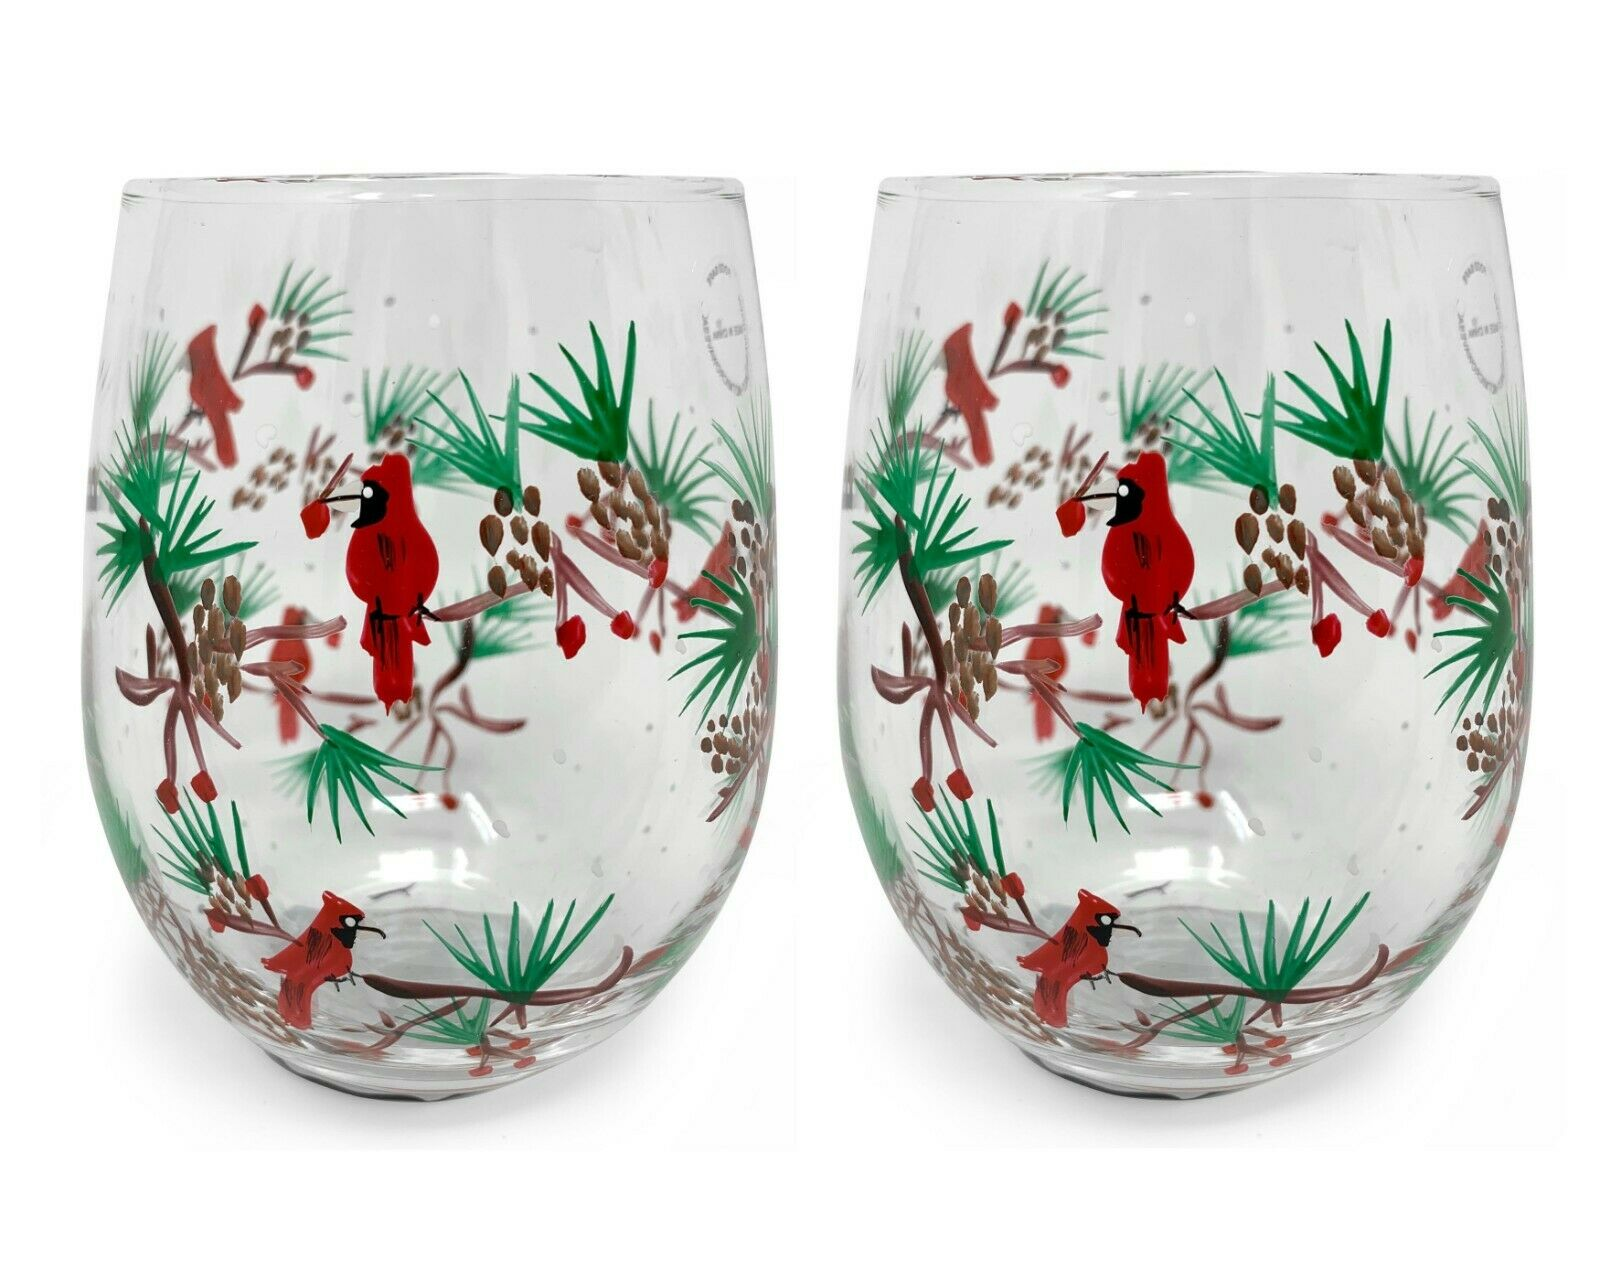 Christmas Stemless Wine Glass Holiday Presents Ideas Christmas Gifts Wine Lovers Drinking Glasses Gift Holly Cardinal Birds 2pk Walmart Com Walmart Com